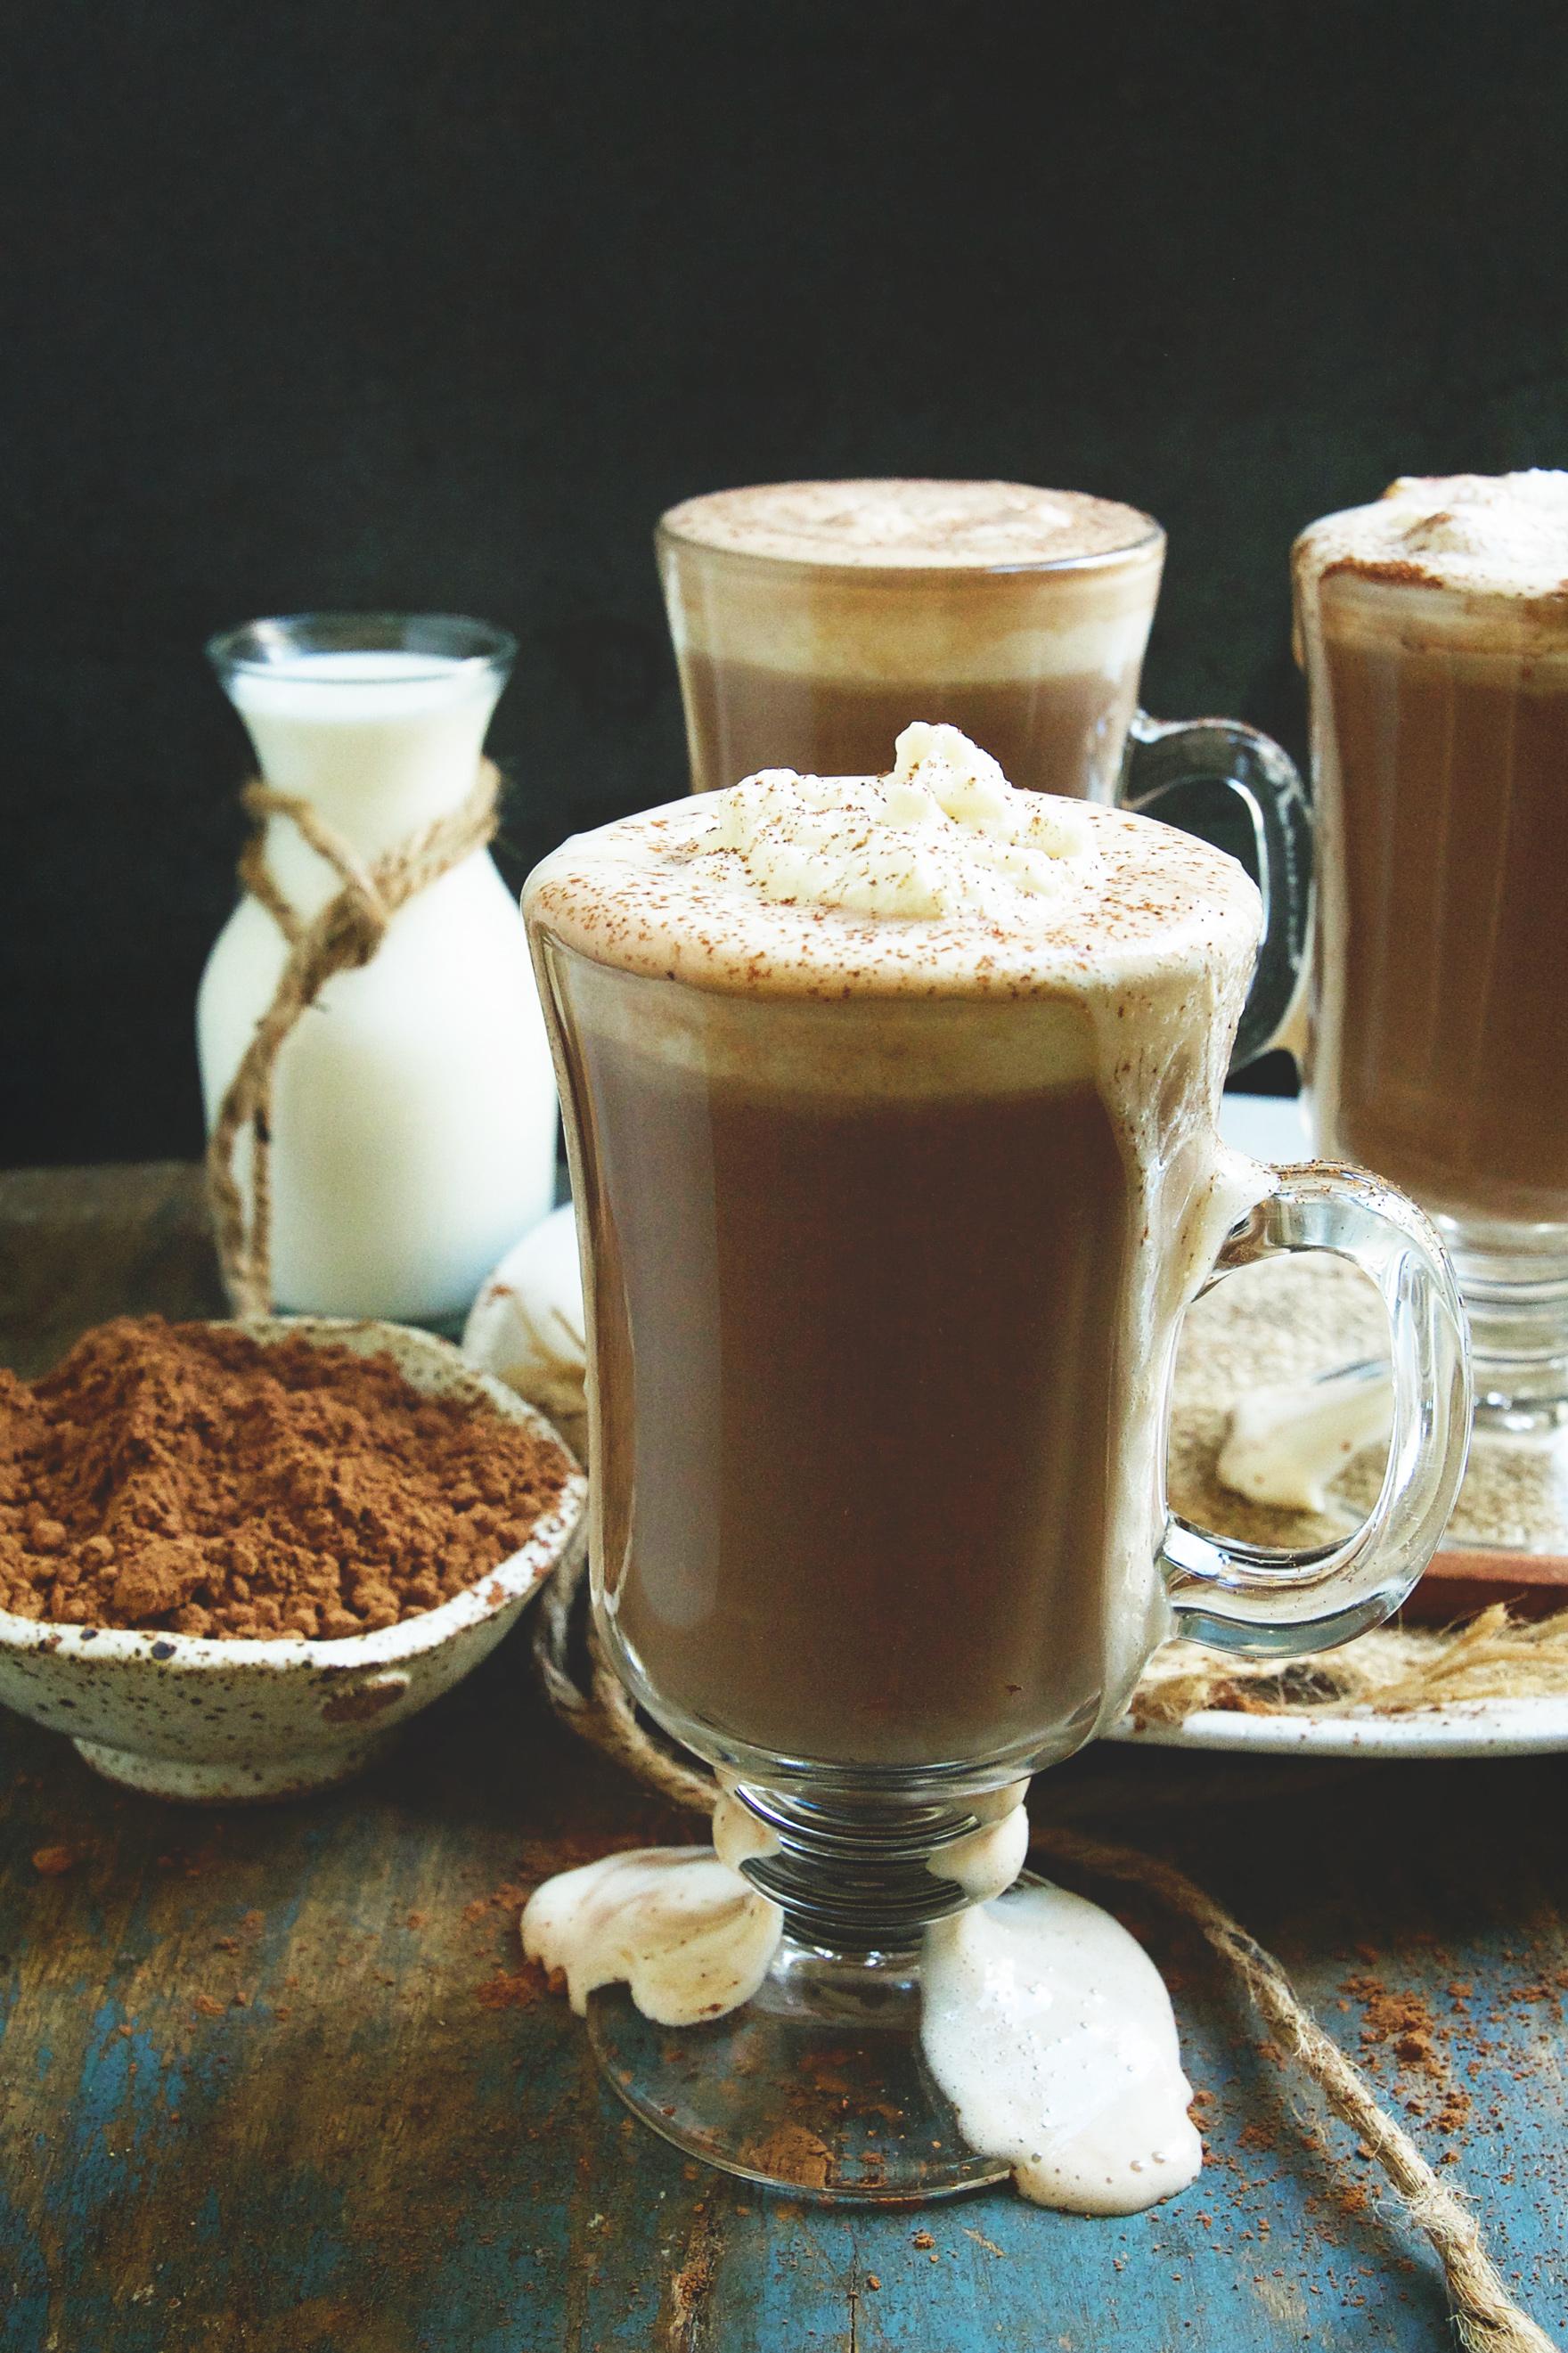 Keto-Friendly Sugar-Free Hot Chocolate Recipe -Ready to serve.